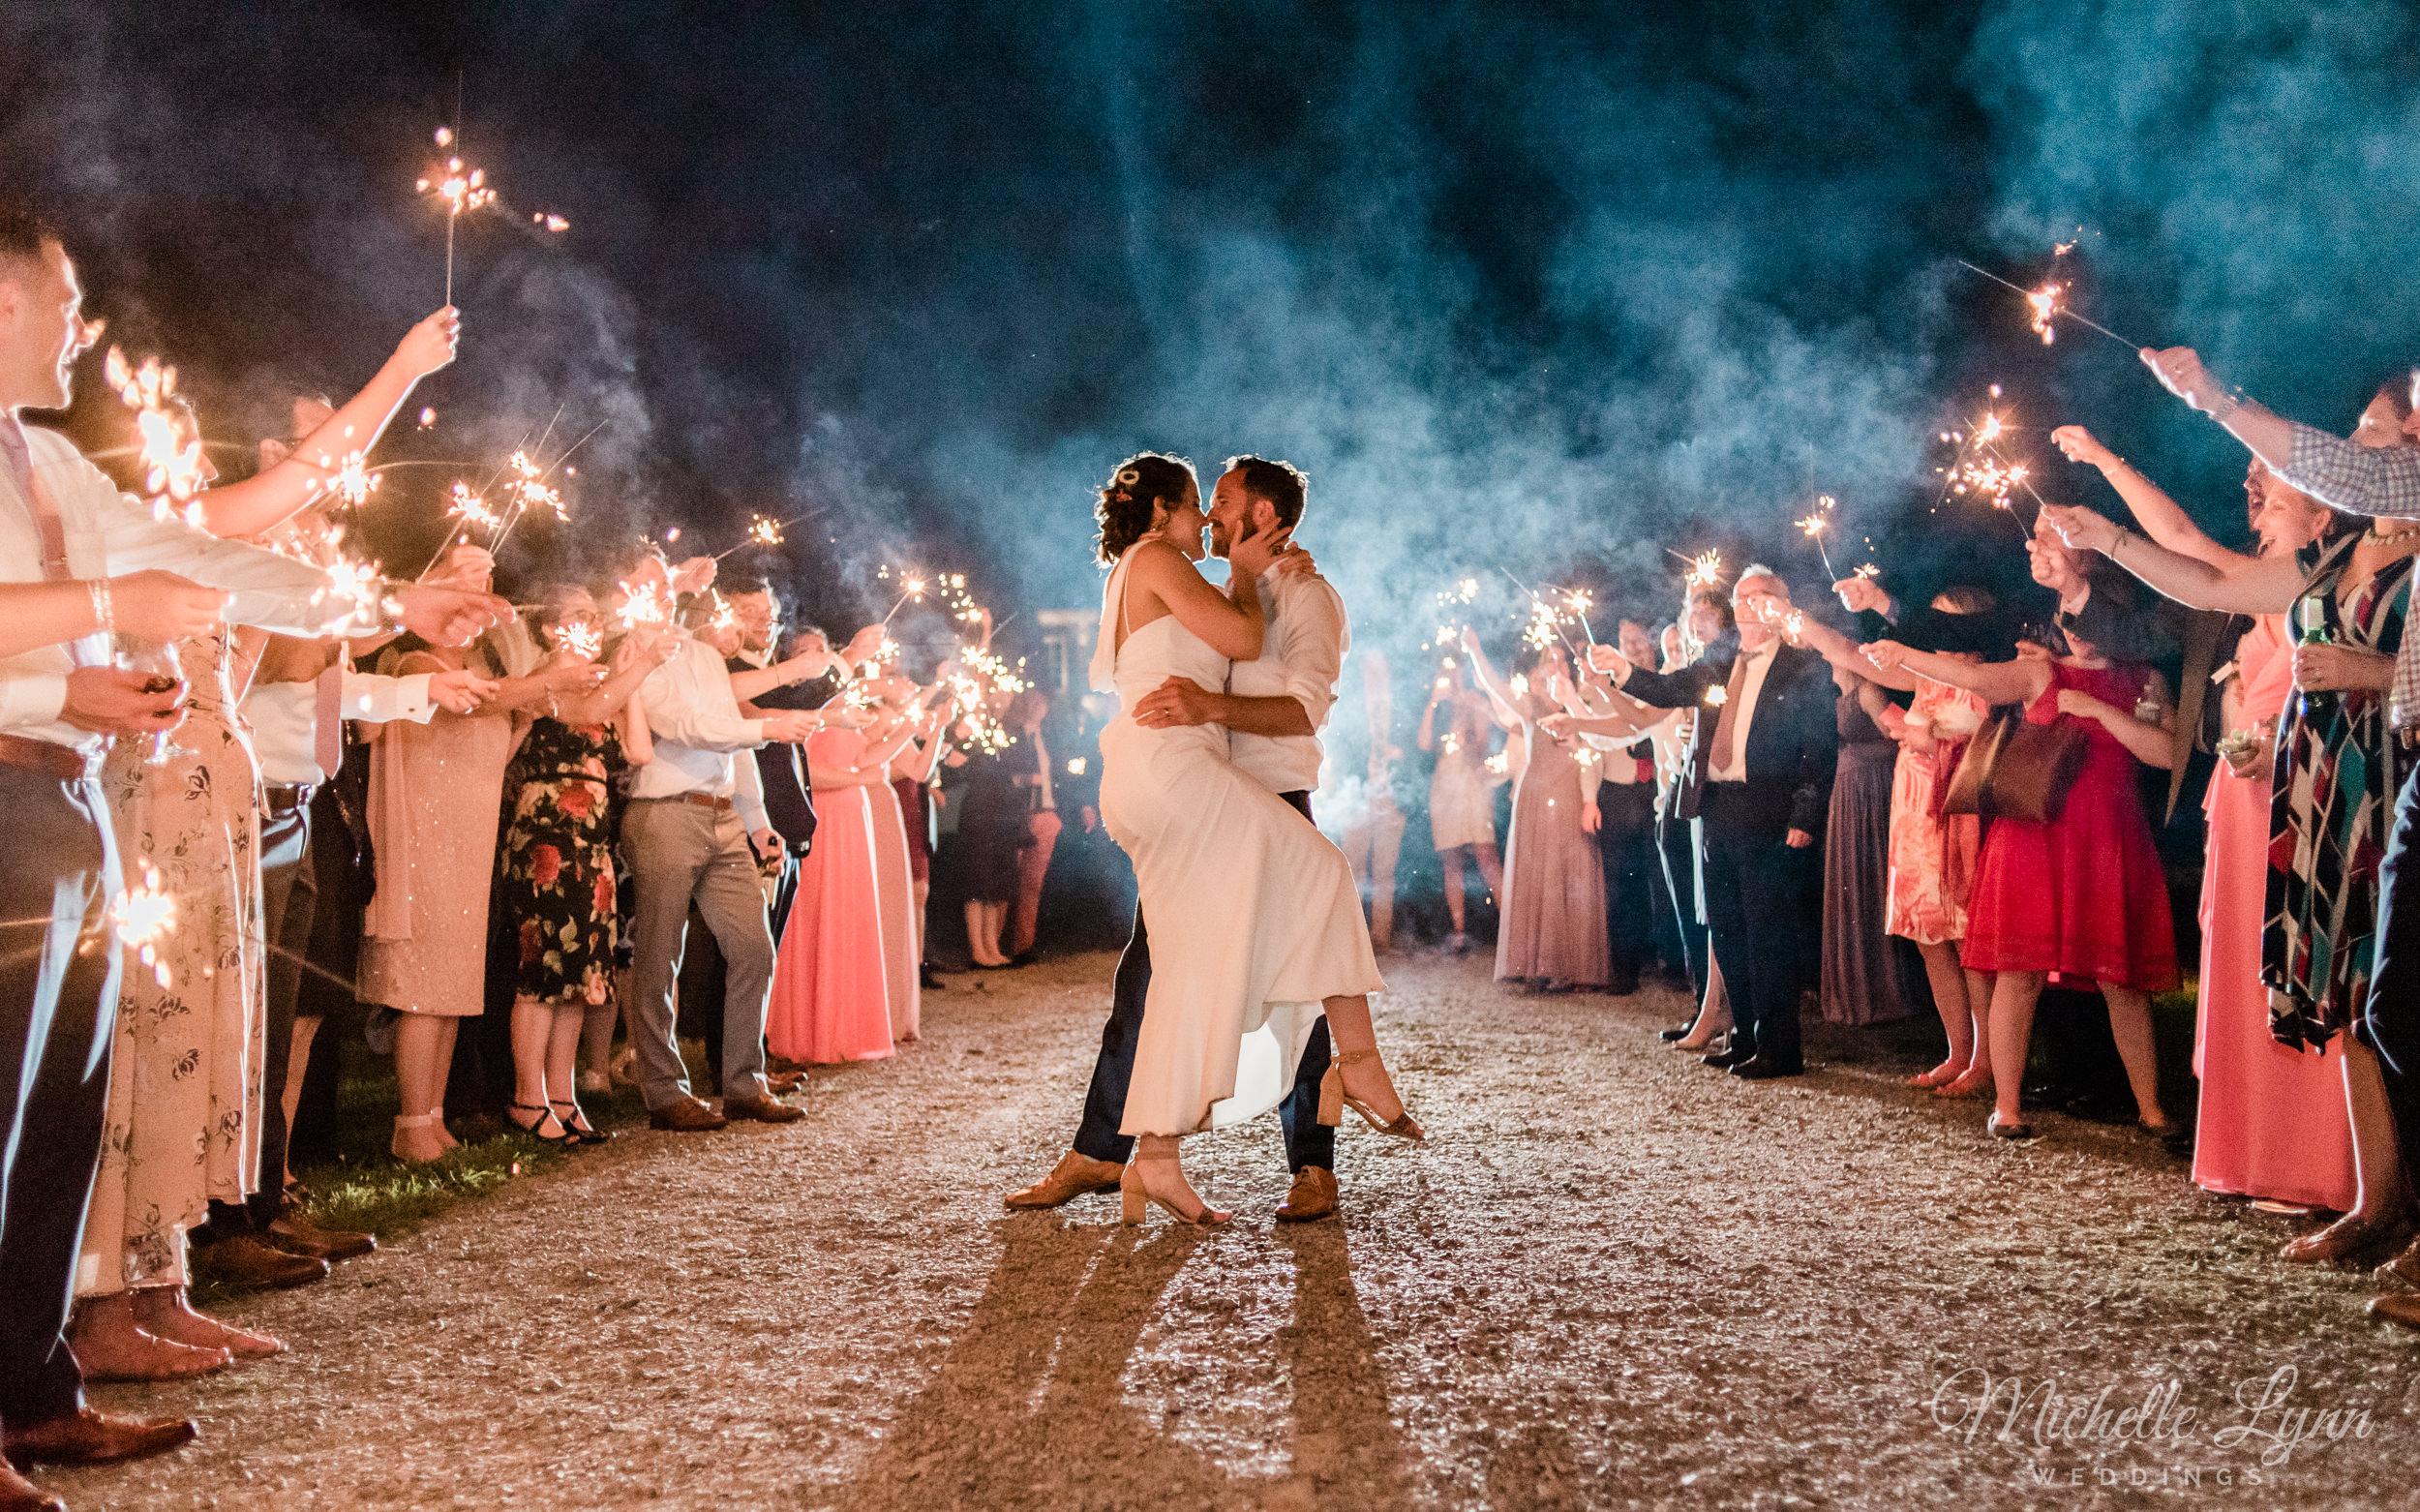 mlw-unionville-vineyards-nj-wedding-photography-112.jpg